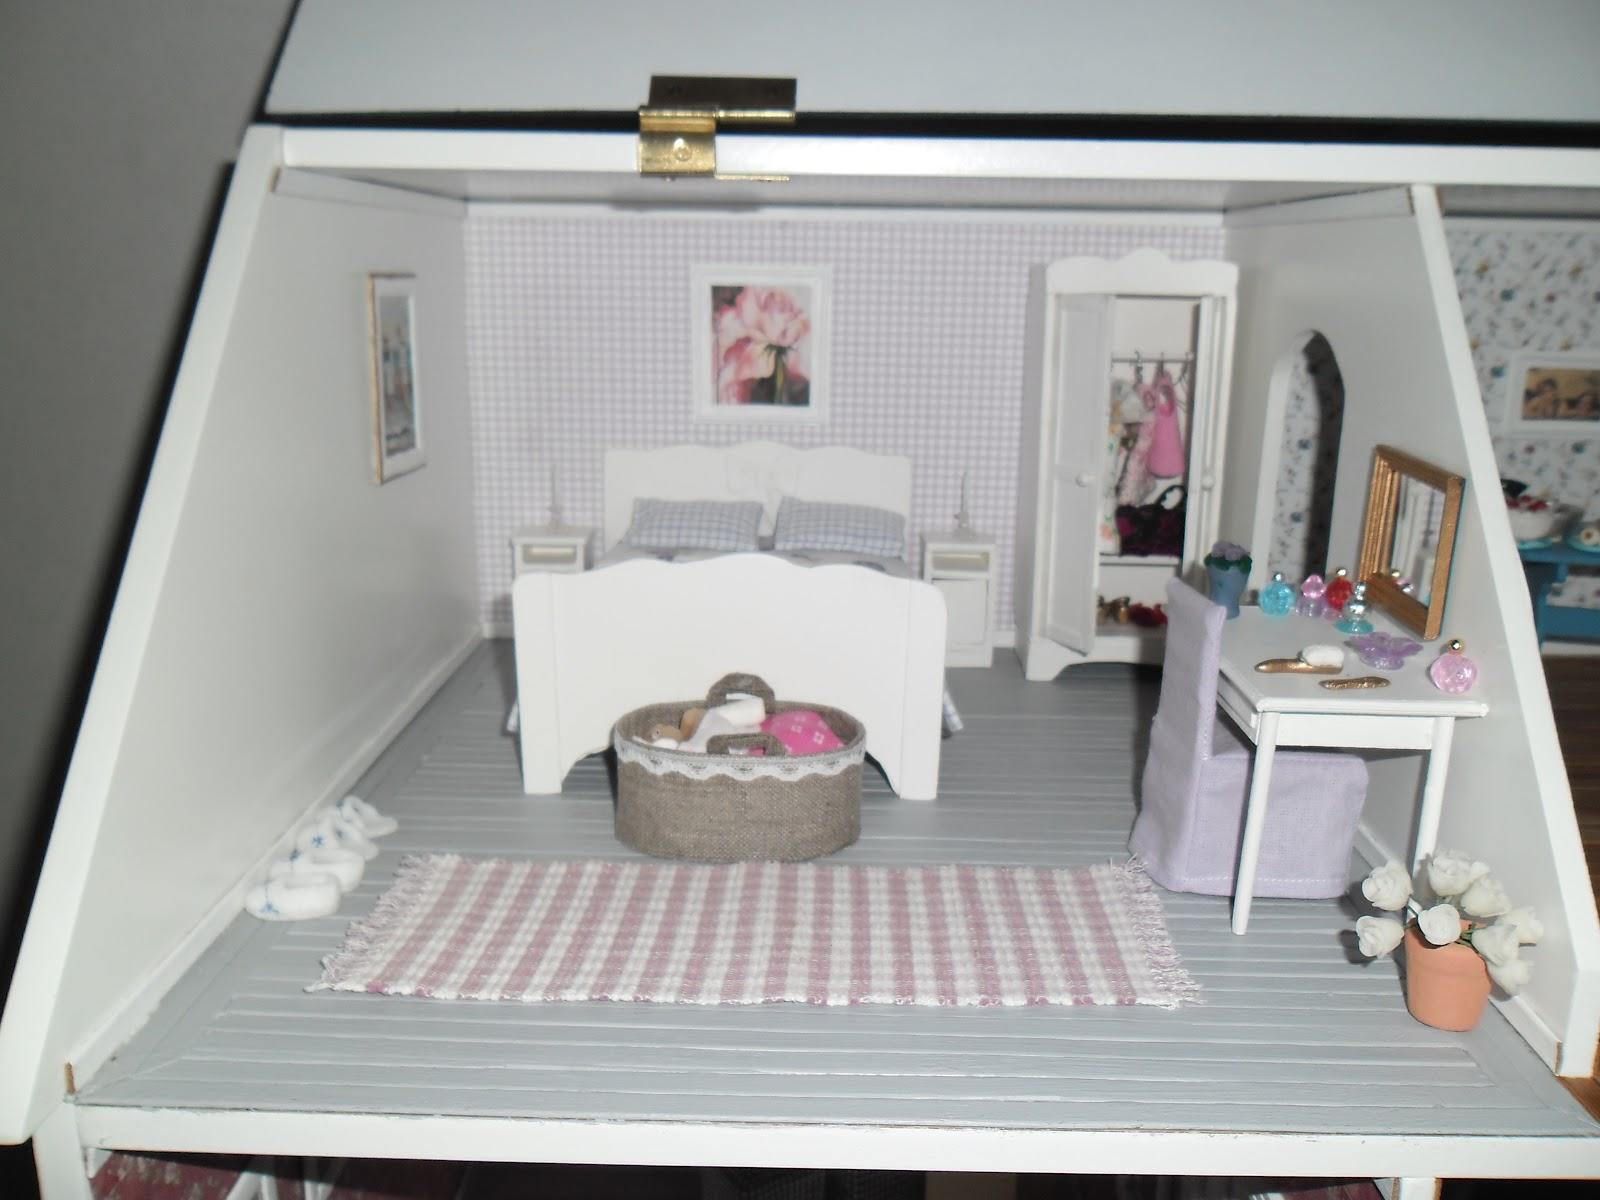 AnneJs miniatyrer: Jag målade golvet i ena sovrummet ljusgrått.